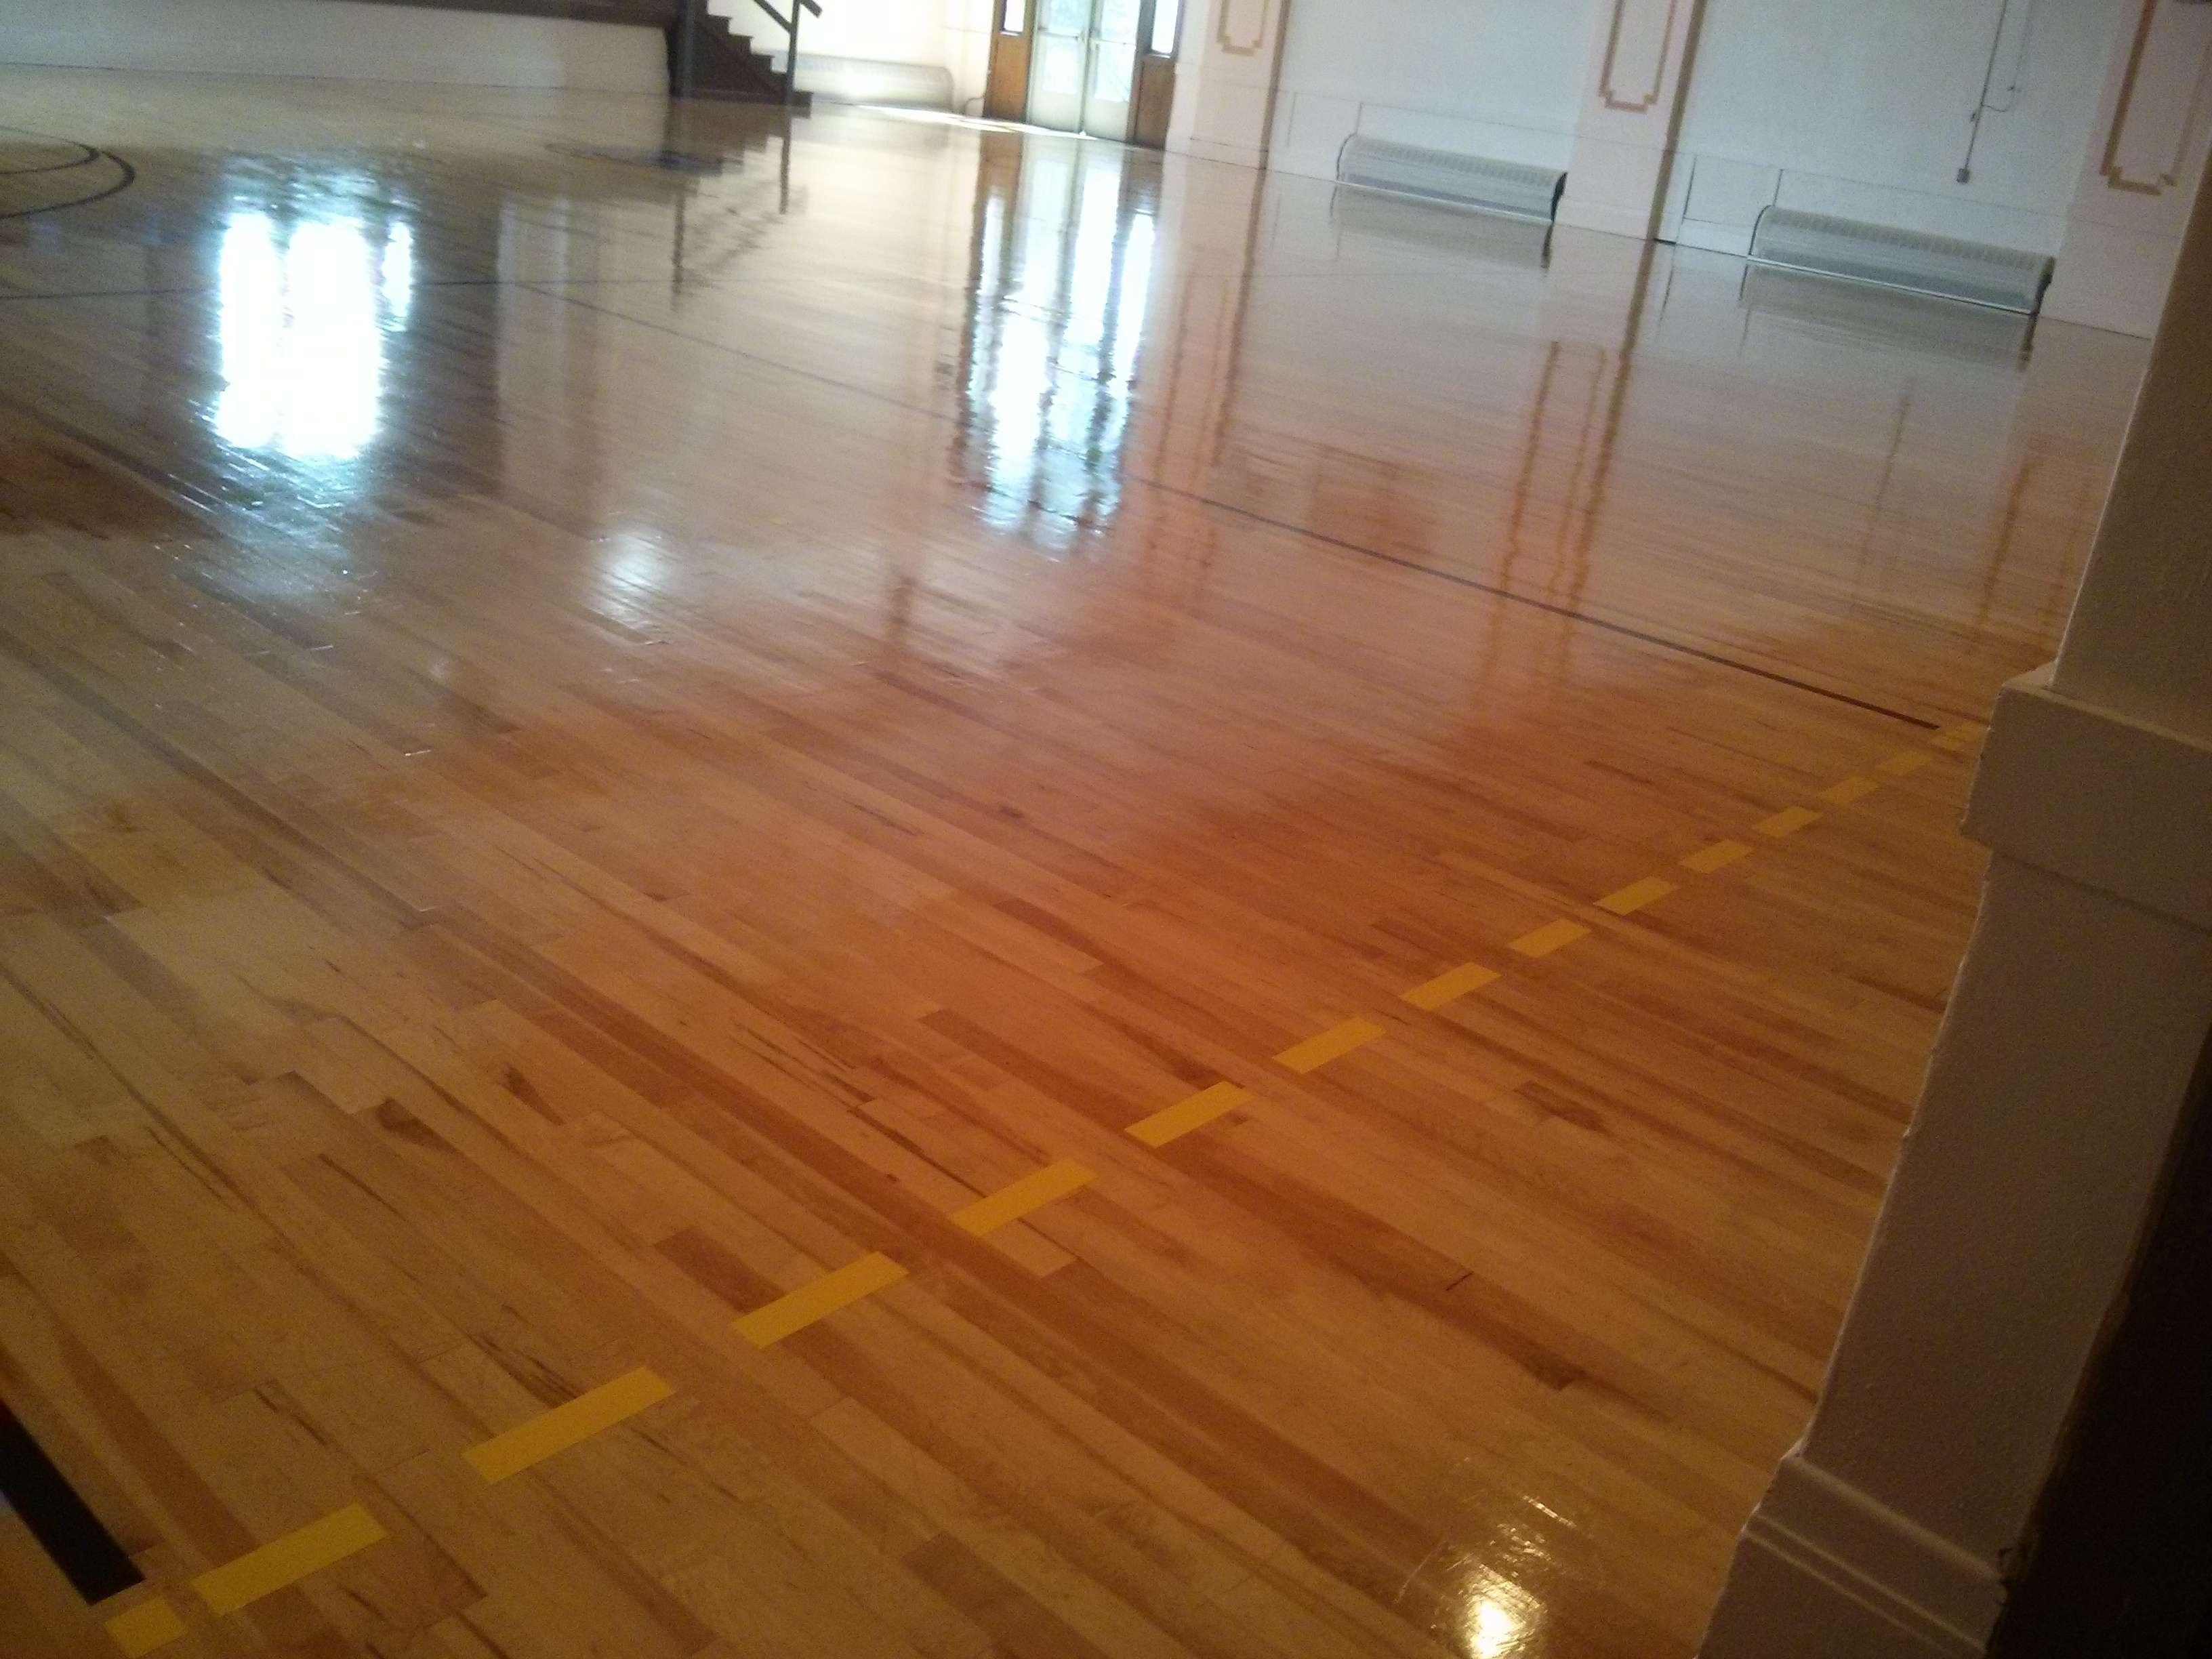 Wood Gym Floor Clear Coatings Services Job In Minneapolis